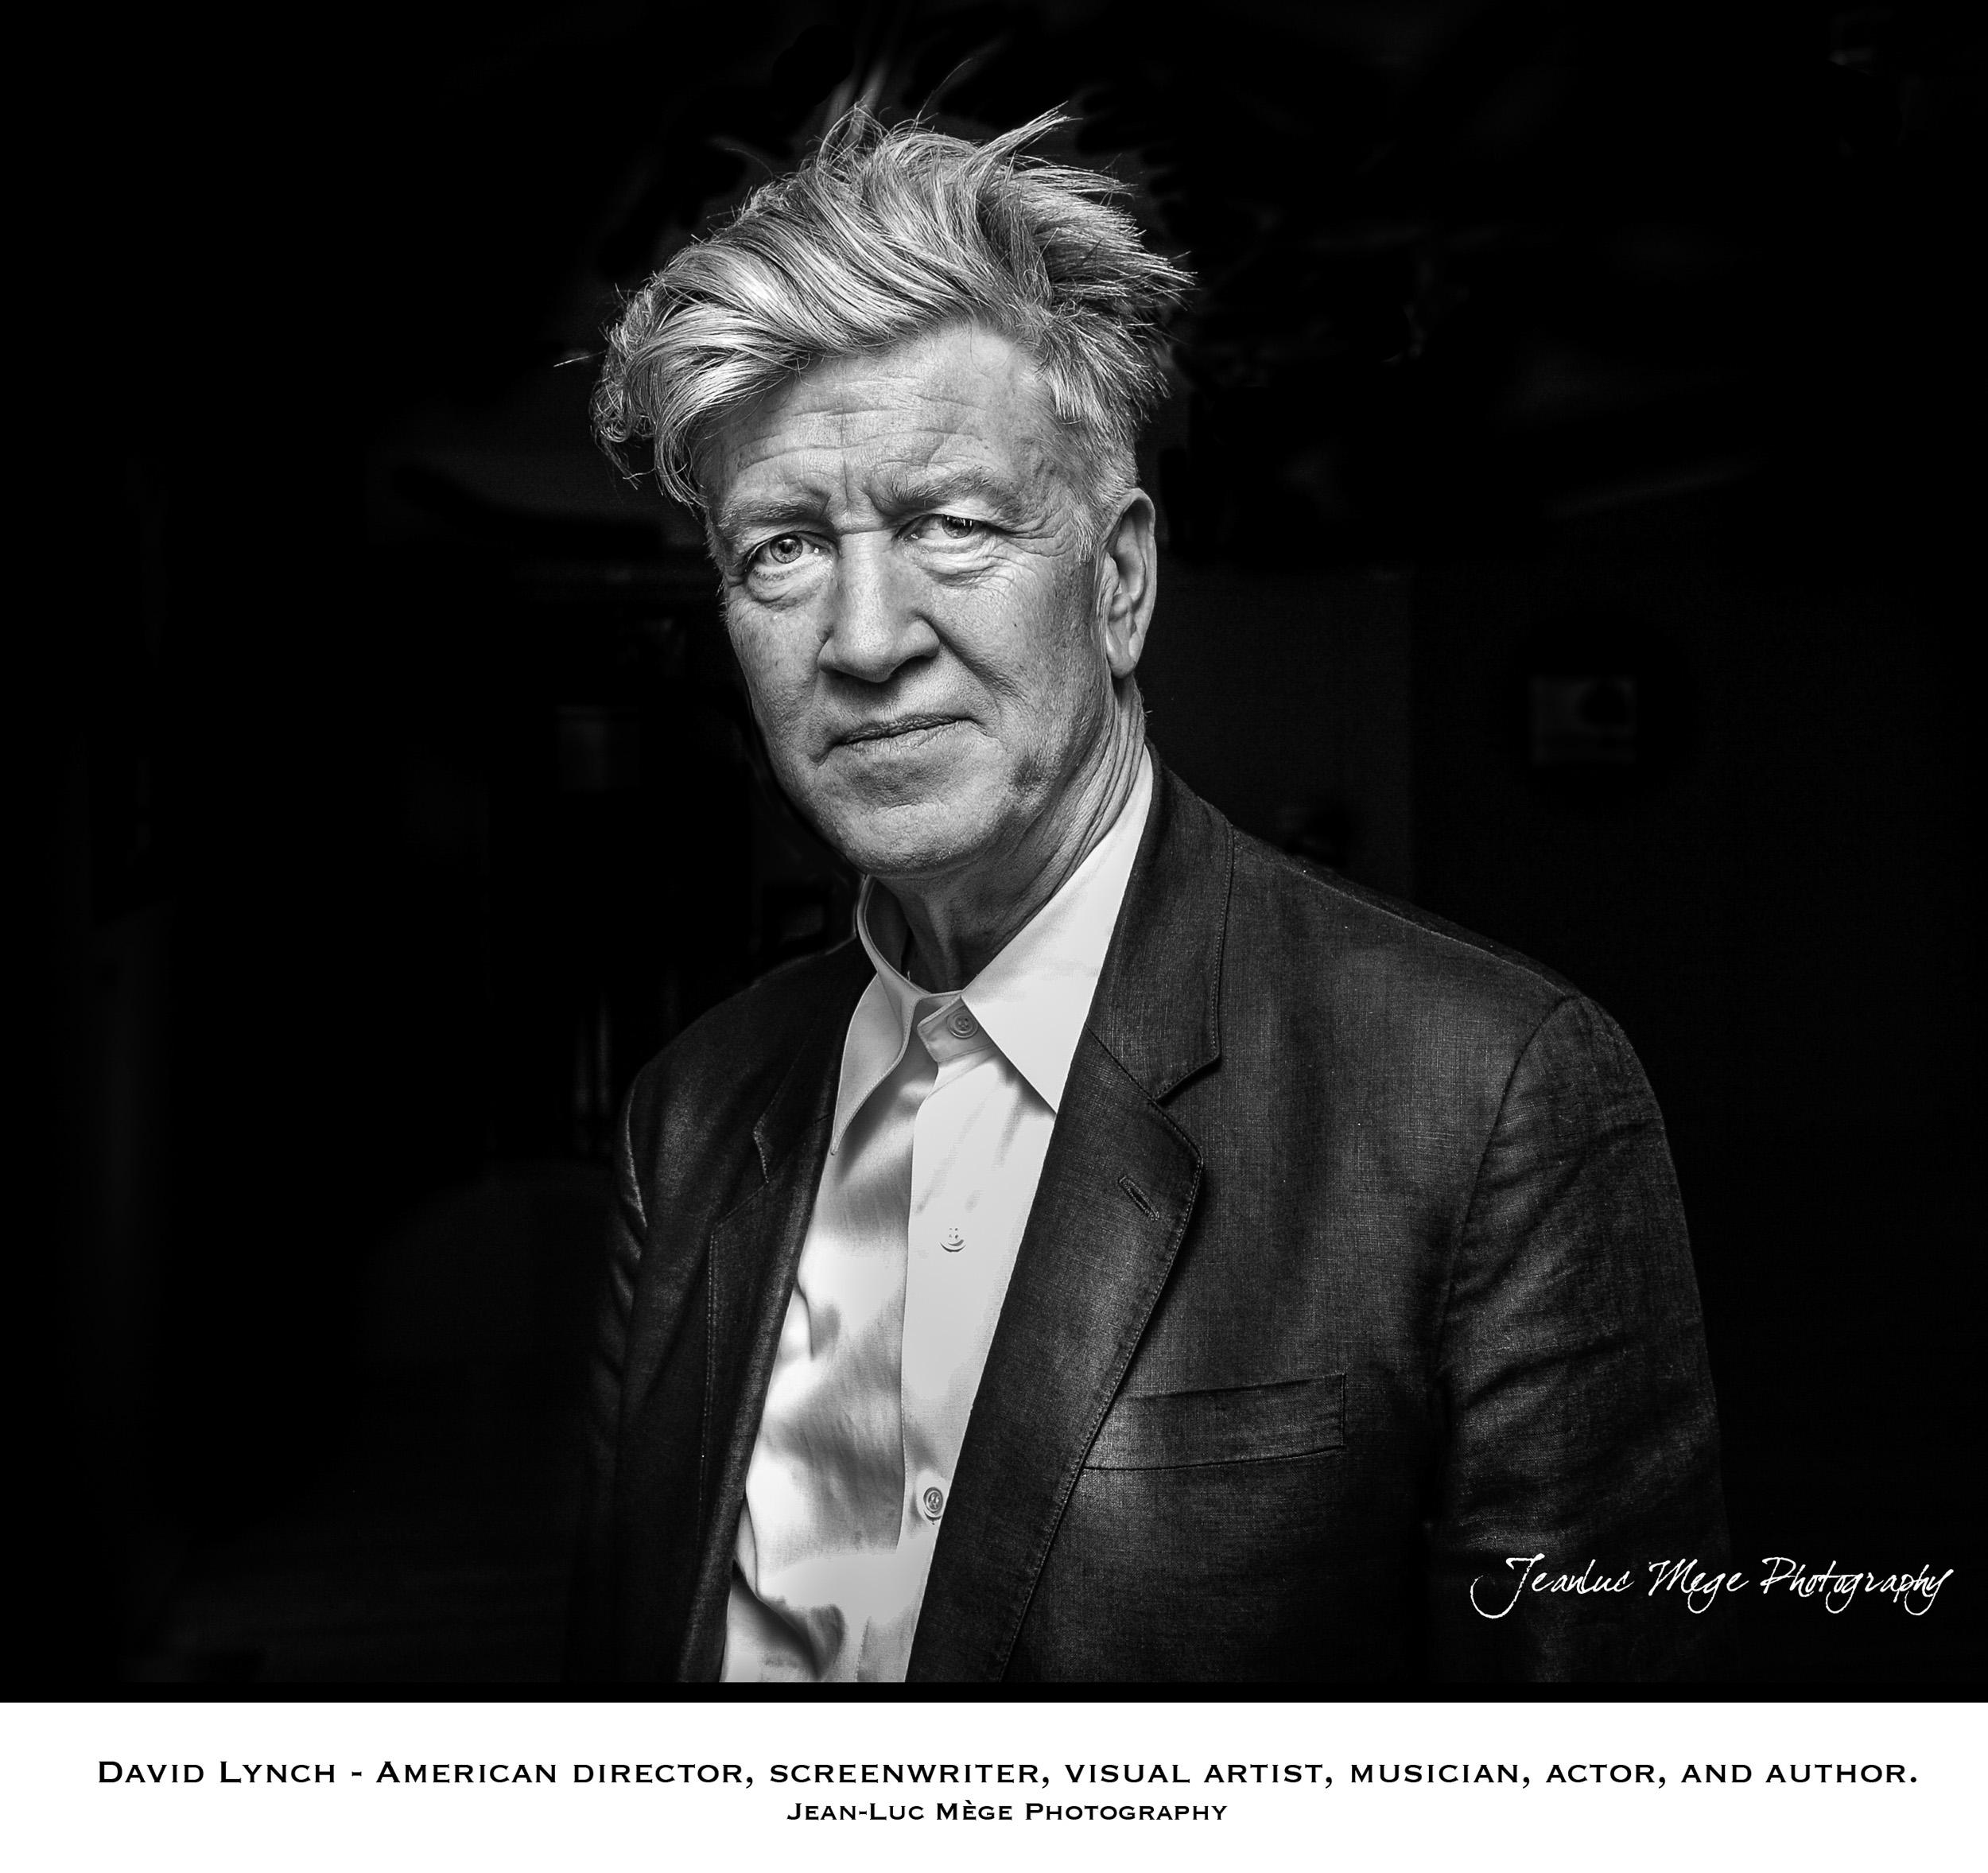 David Lynch 2016 ok-tittle2@jeanlucmege-6416.jpg